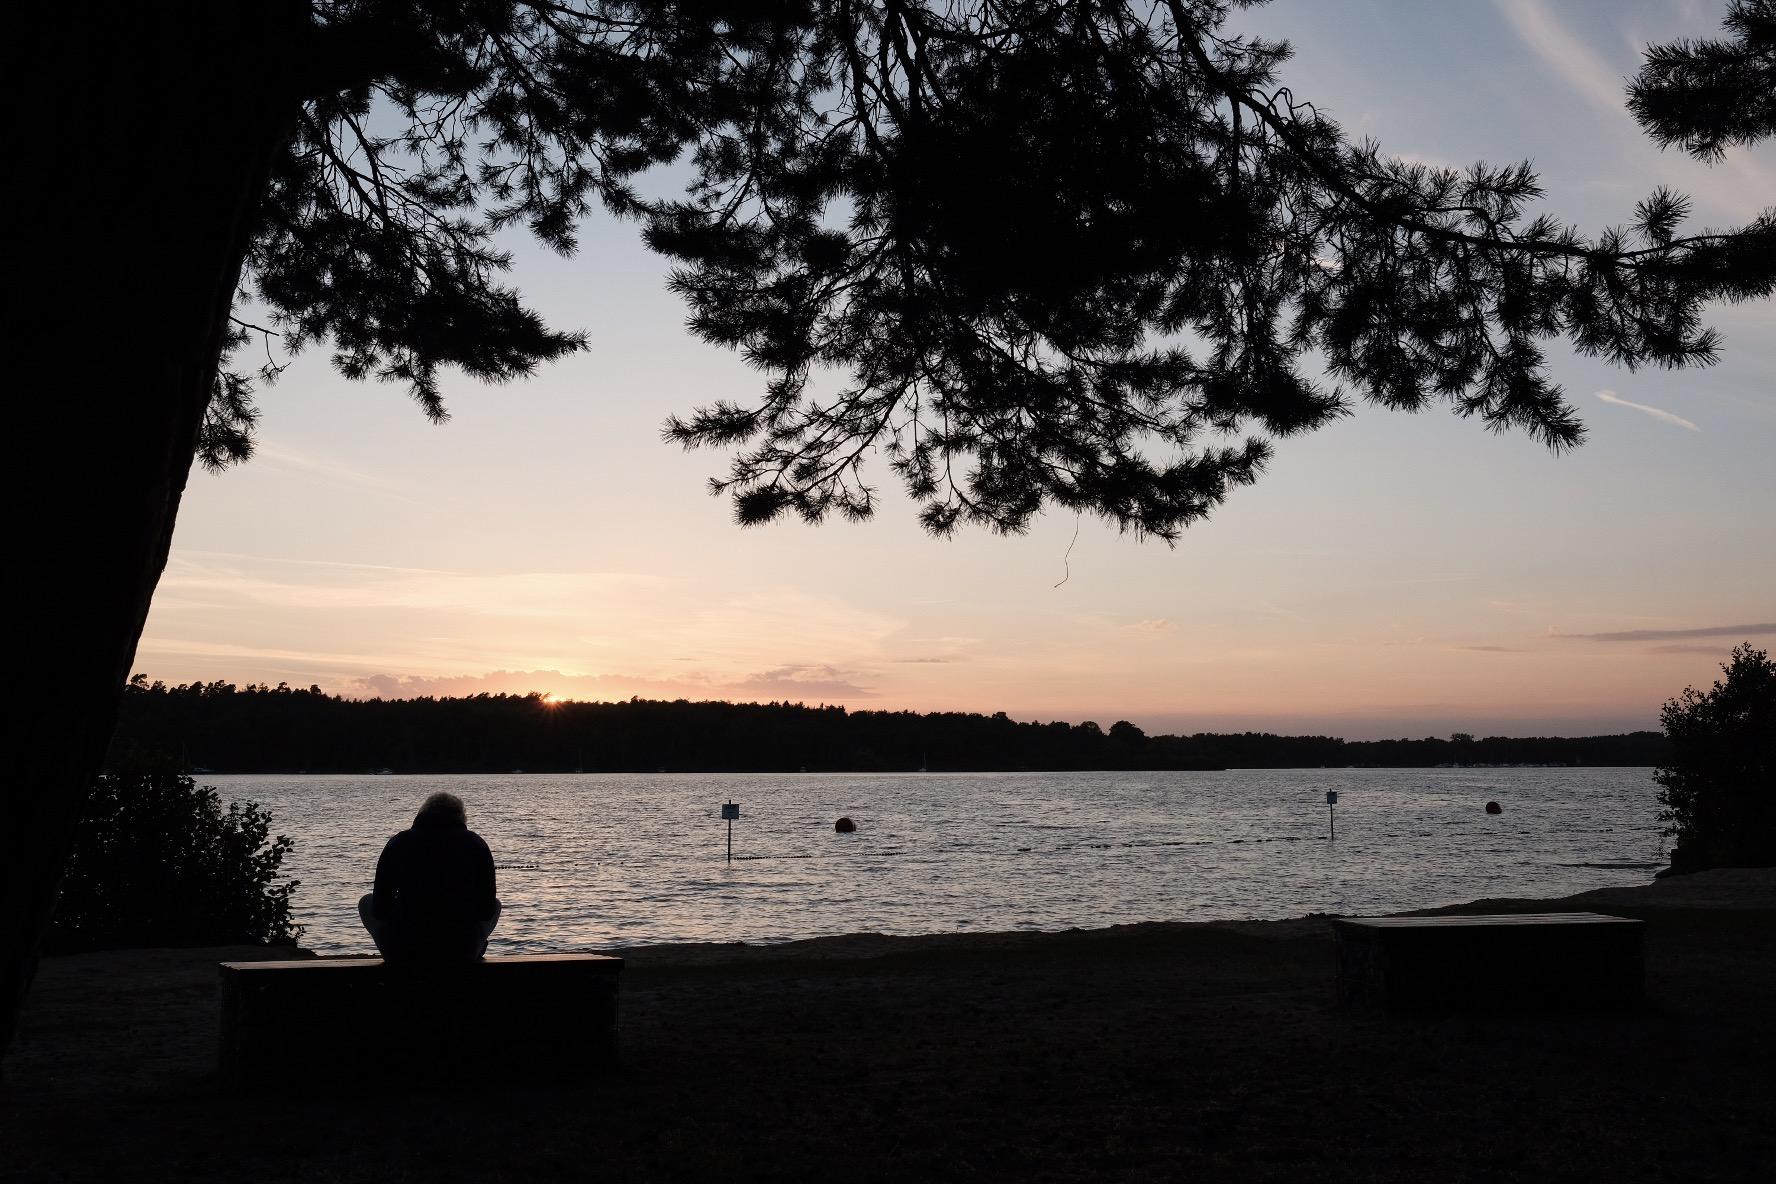 Frau sitzt am See beim Sonnenuntergang